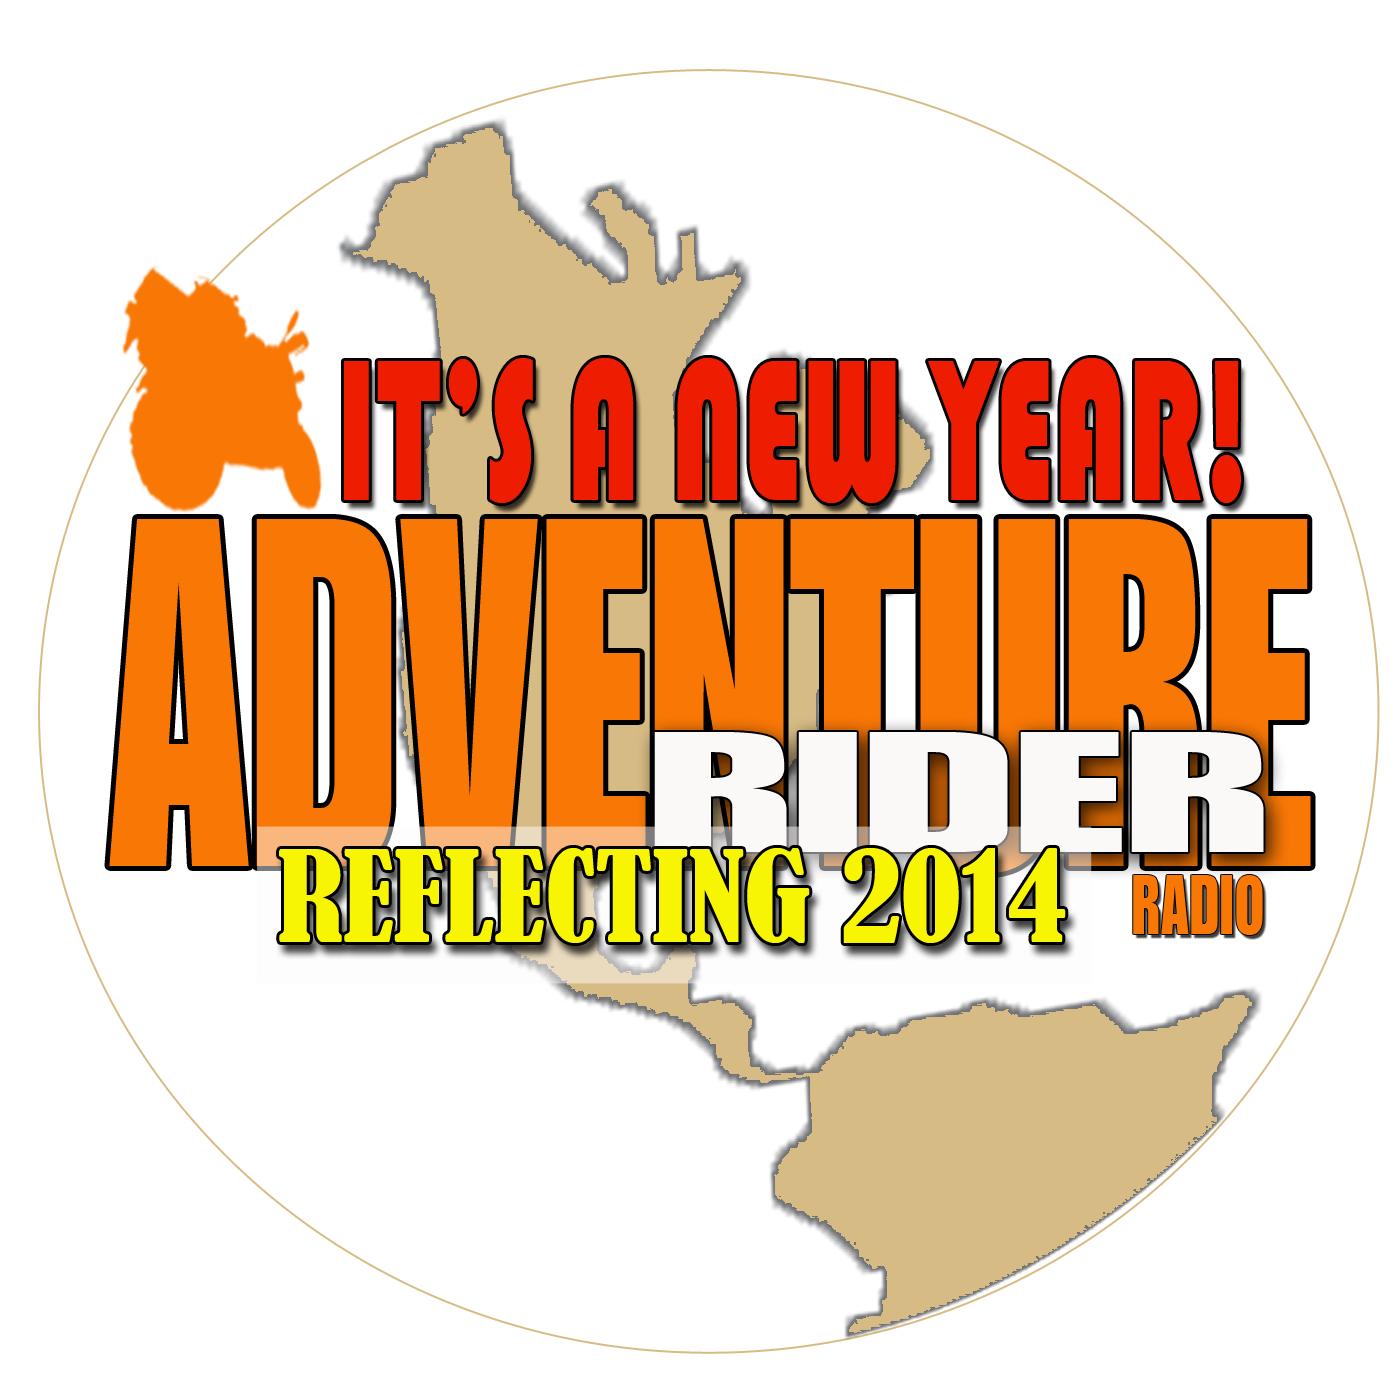 Reflecting-on-Adventure-Rider-Radio-for-2014